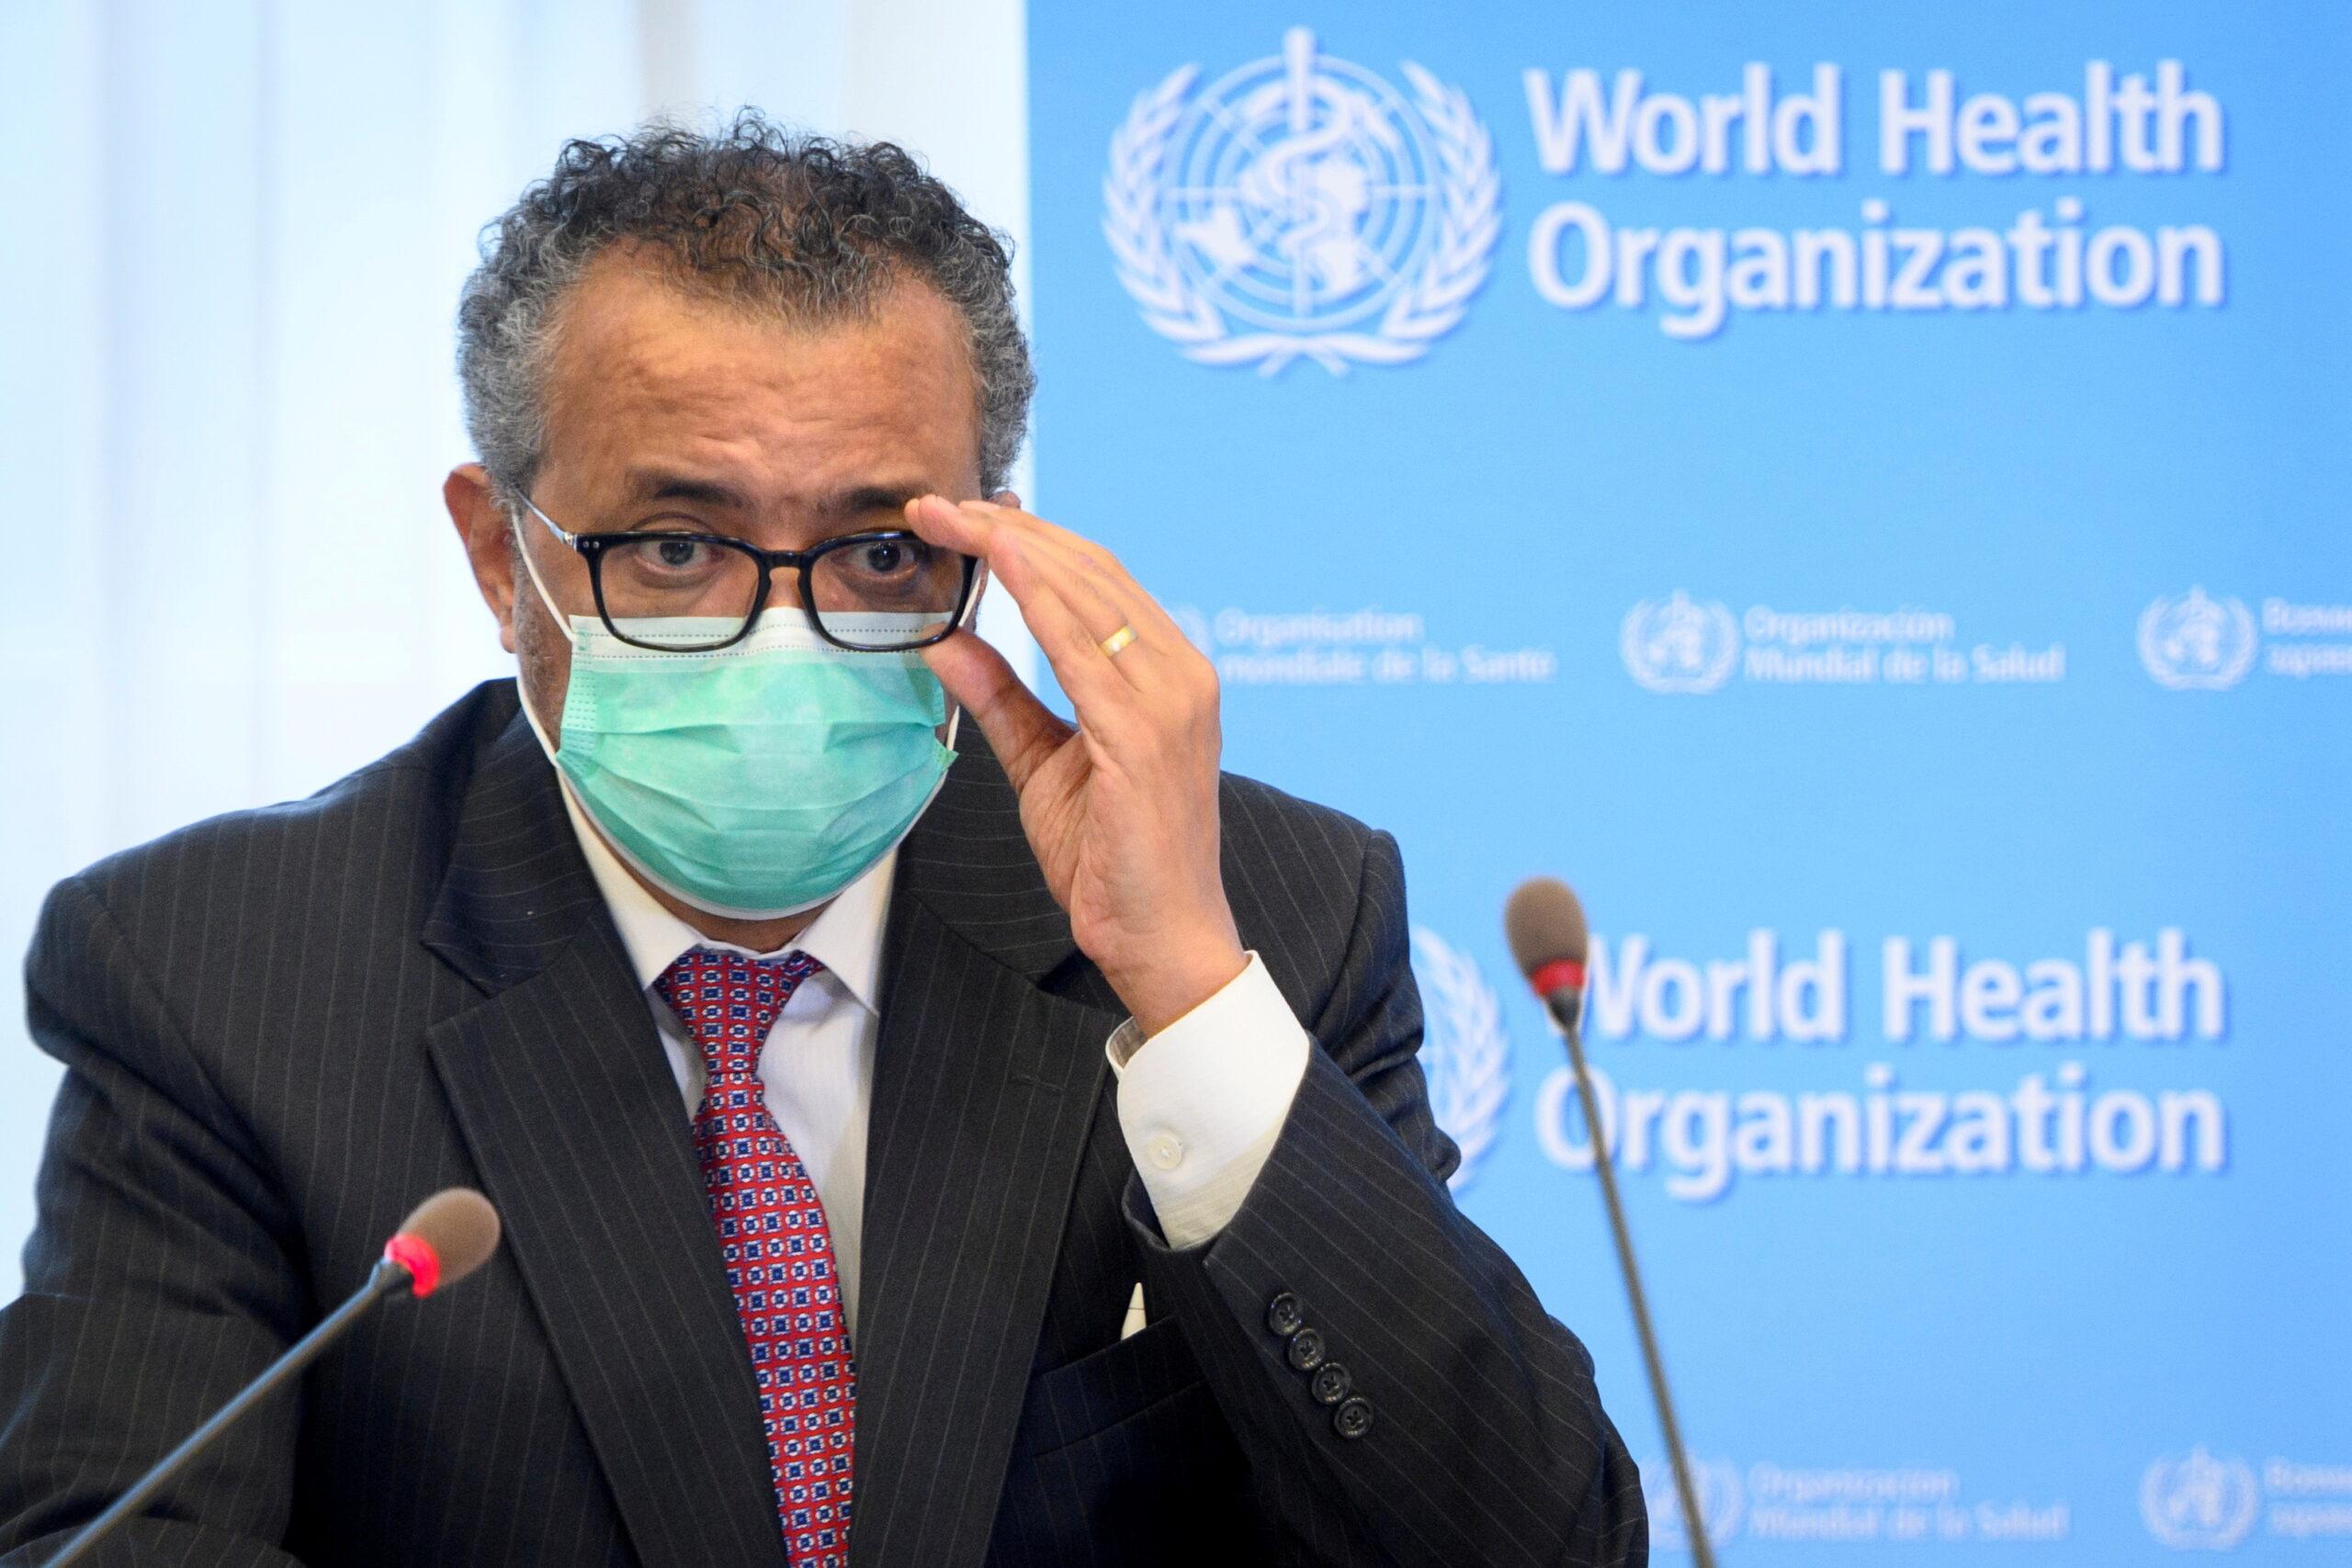 Diretor-geral da OMS, Tedros Adhanom Ghebreyesus